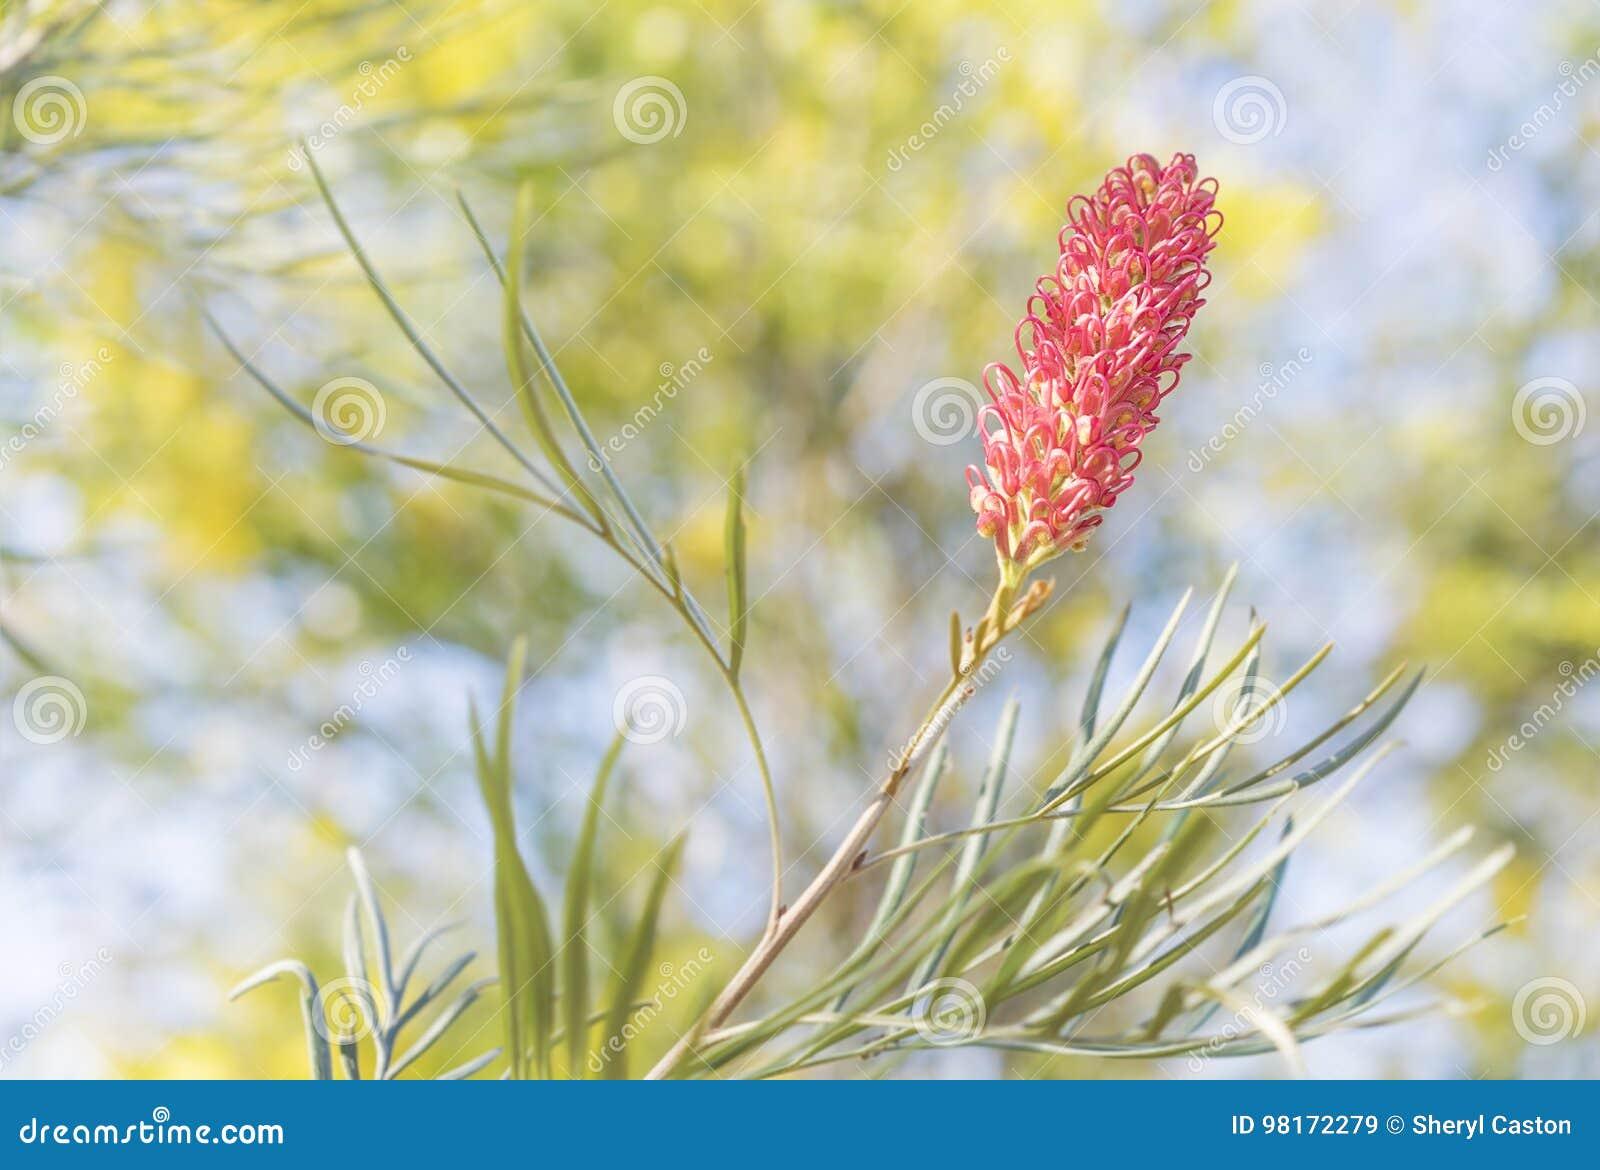 Grevillea With Pink Spider Flower Stock Image Image Of Botanic